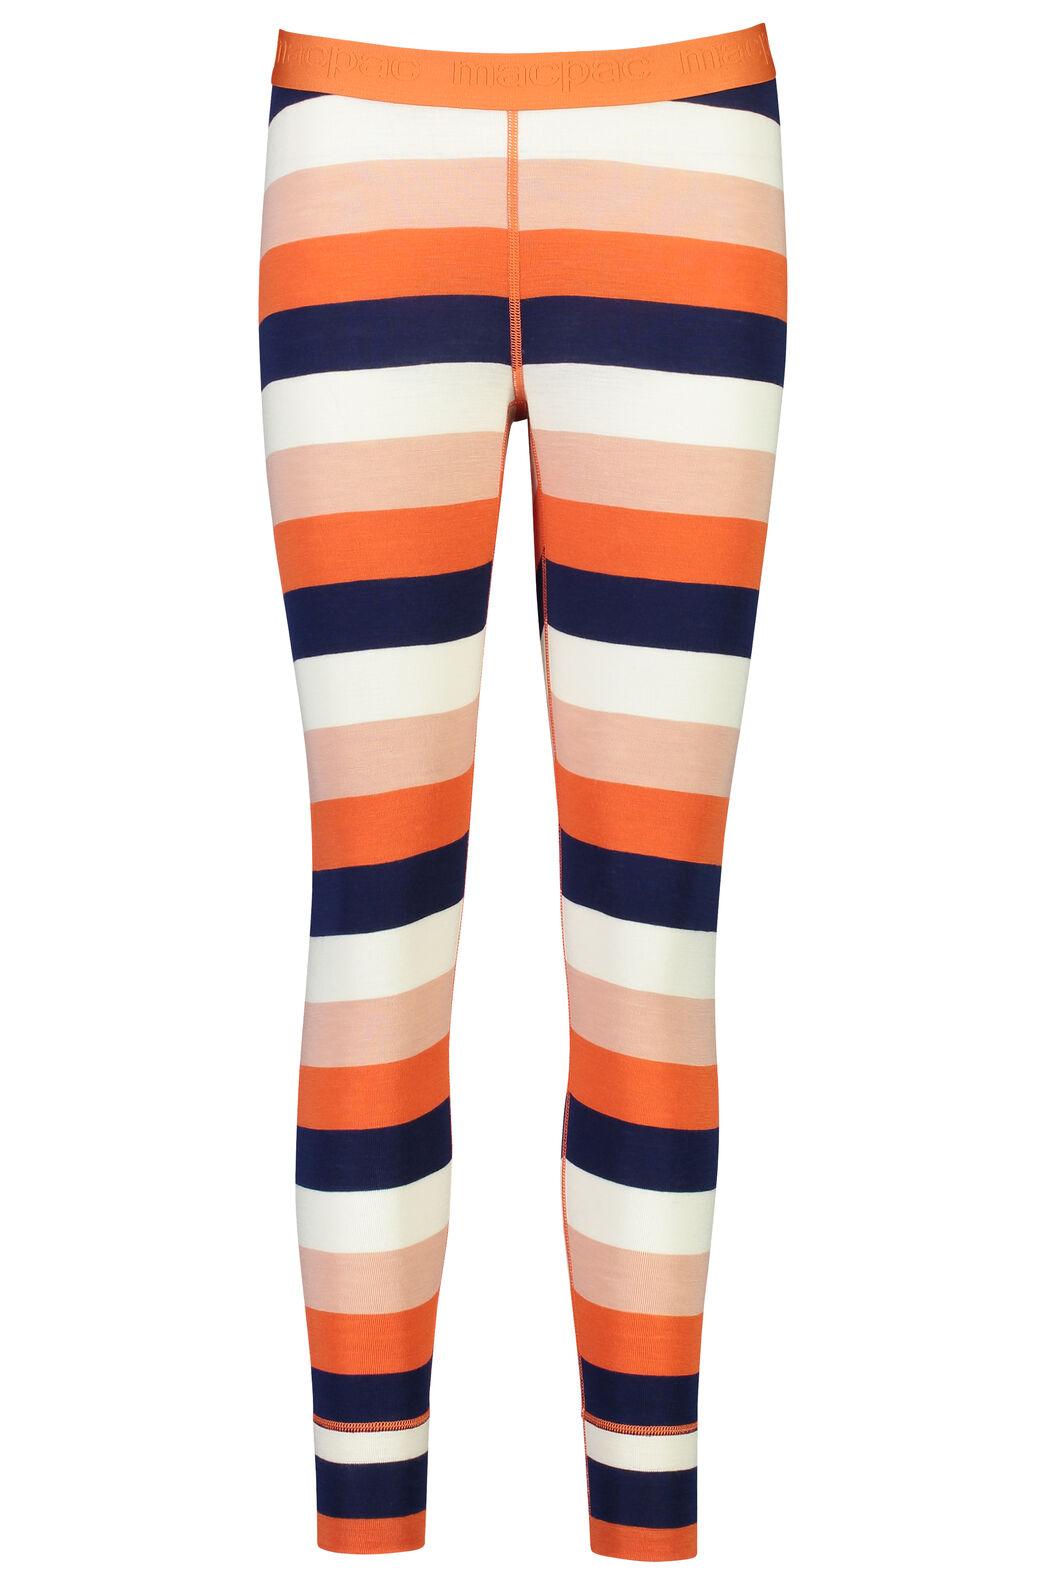 220 Merino Long Johns - Women's, Stripe, hi-res